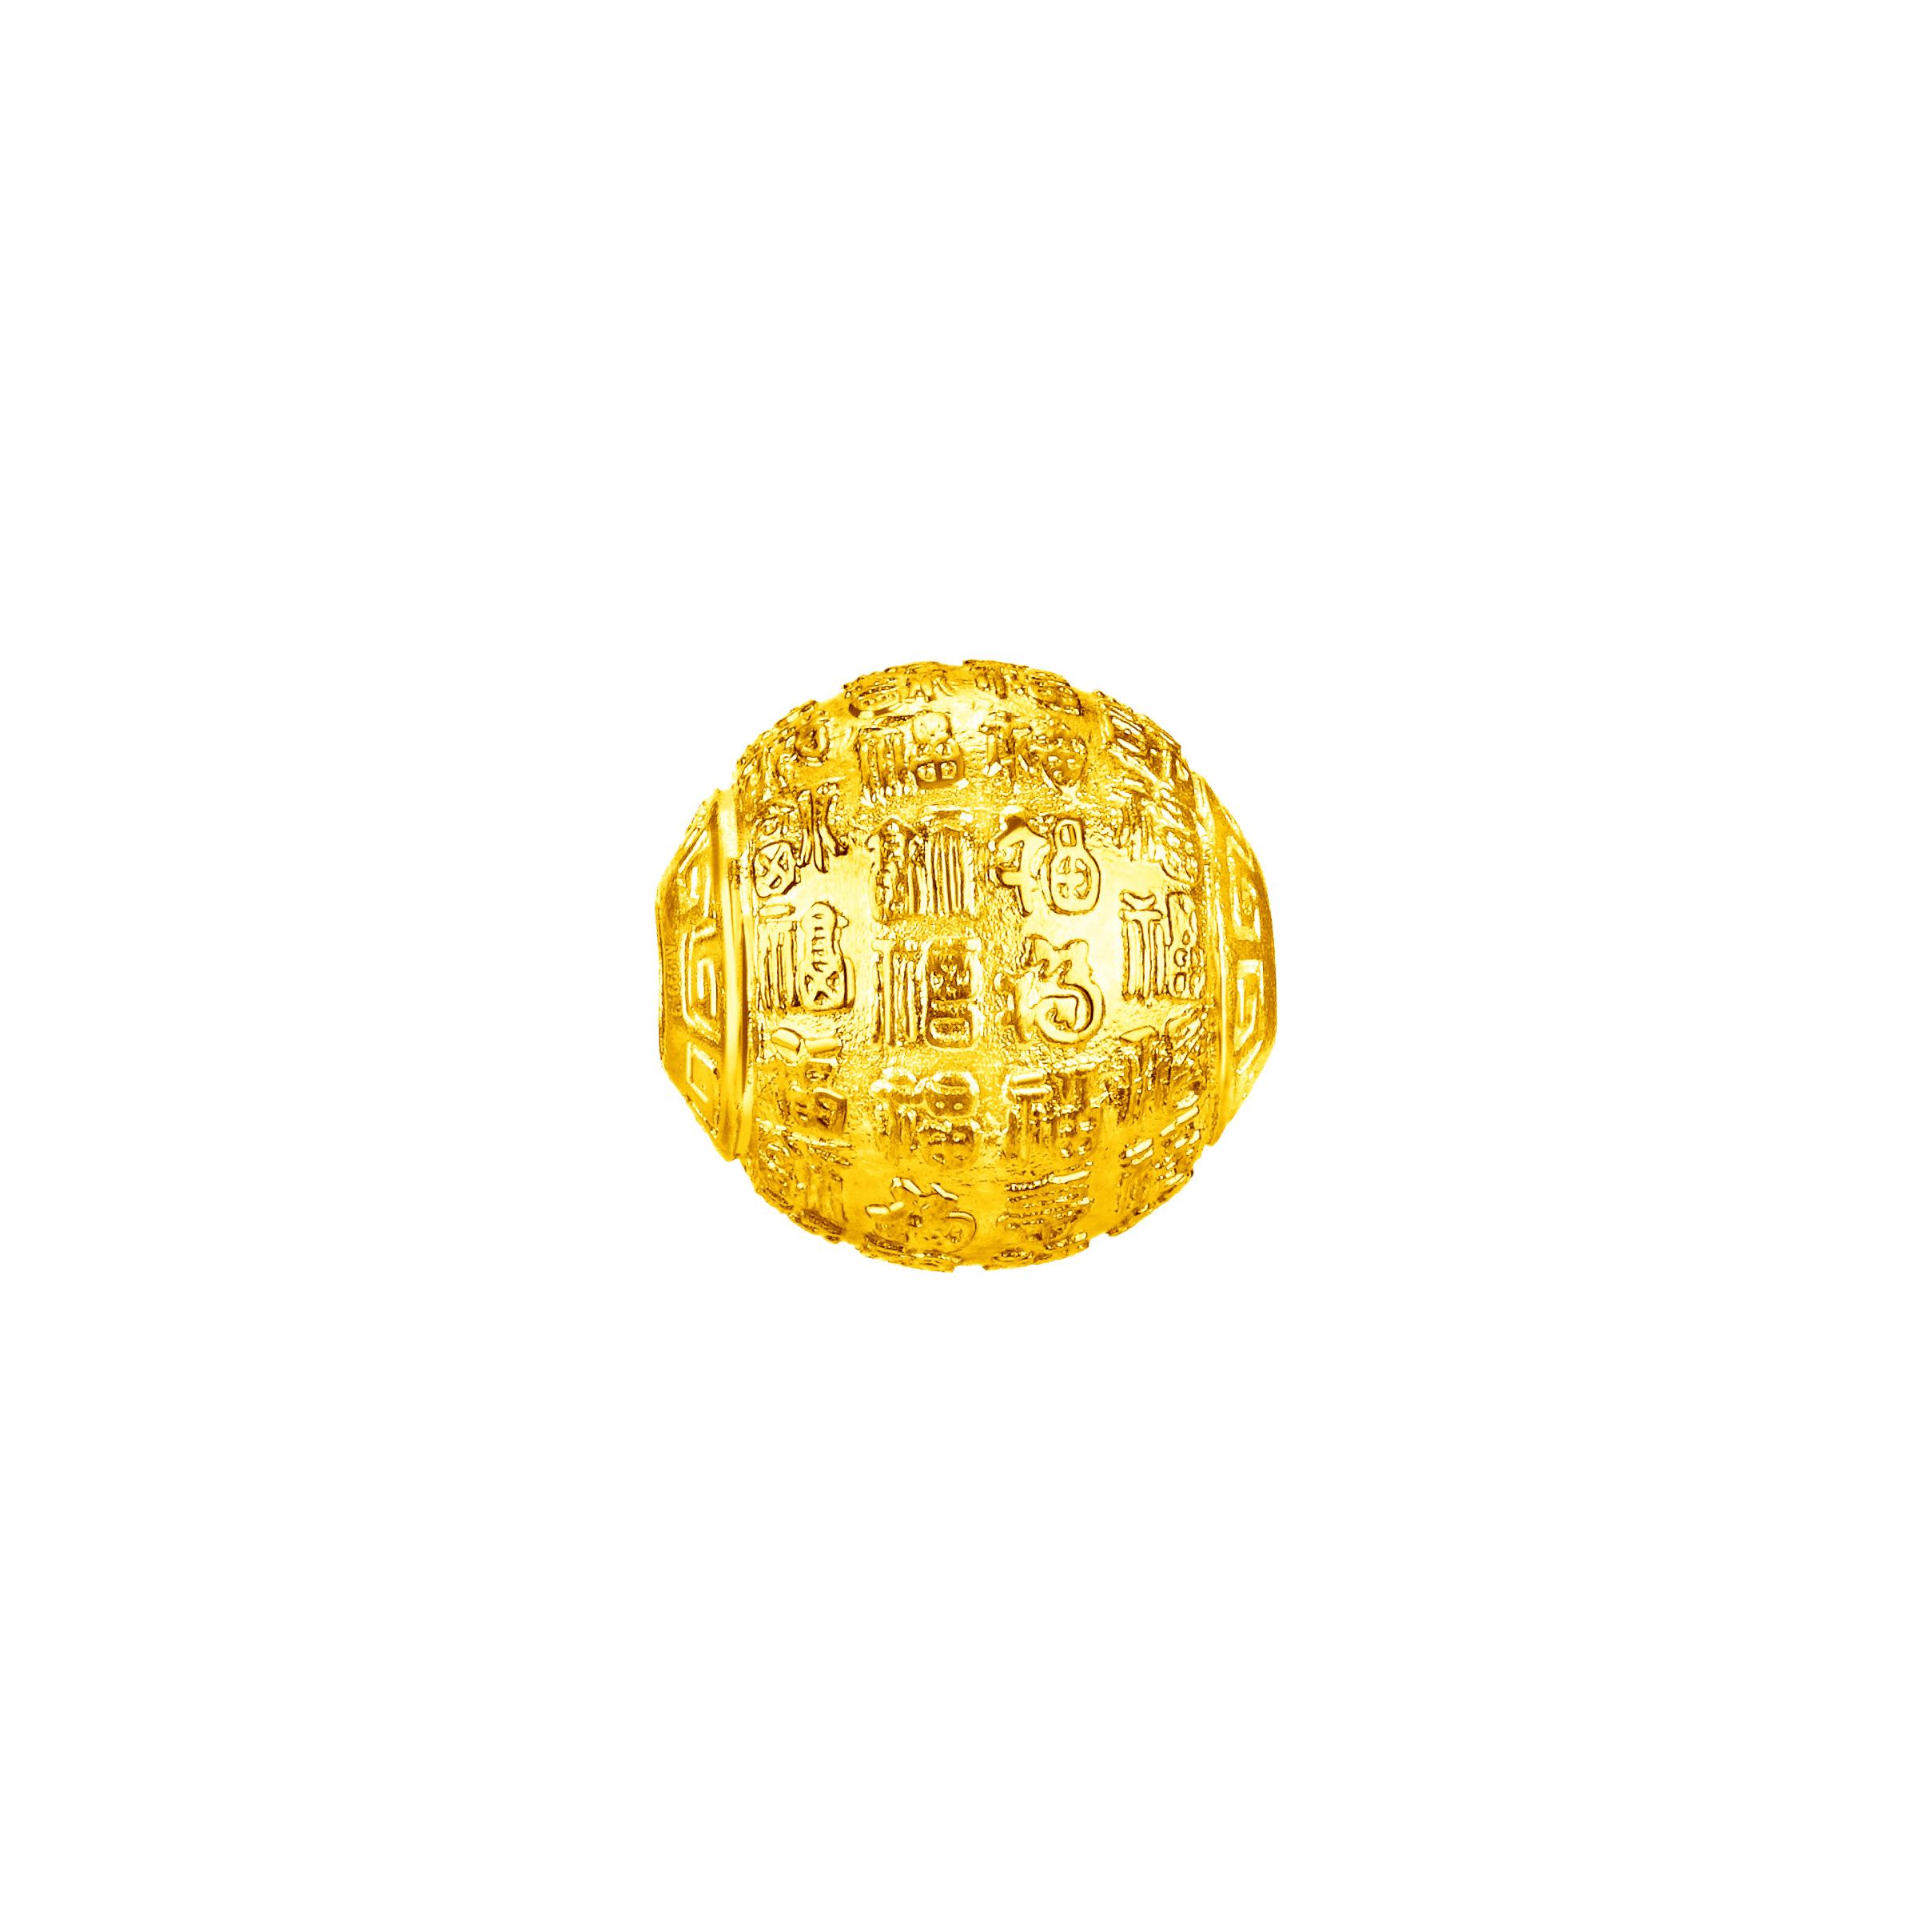 Antique Gold「瑞福」Gold Pendant